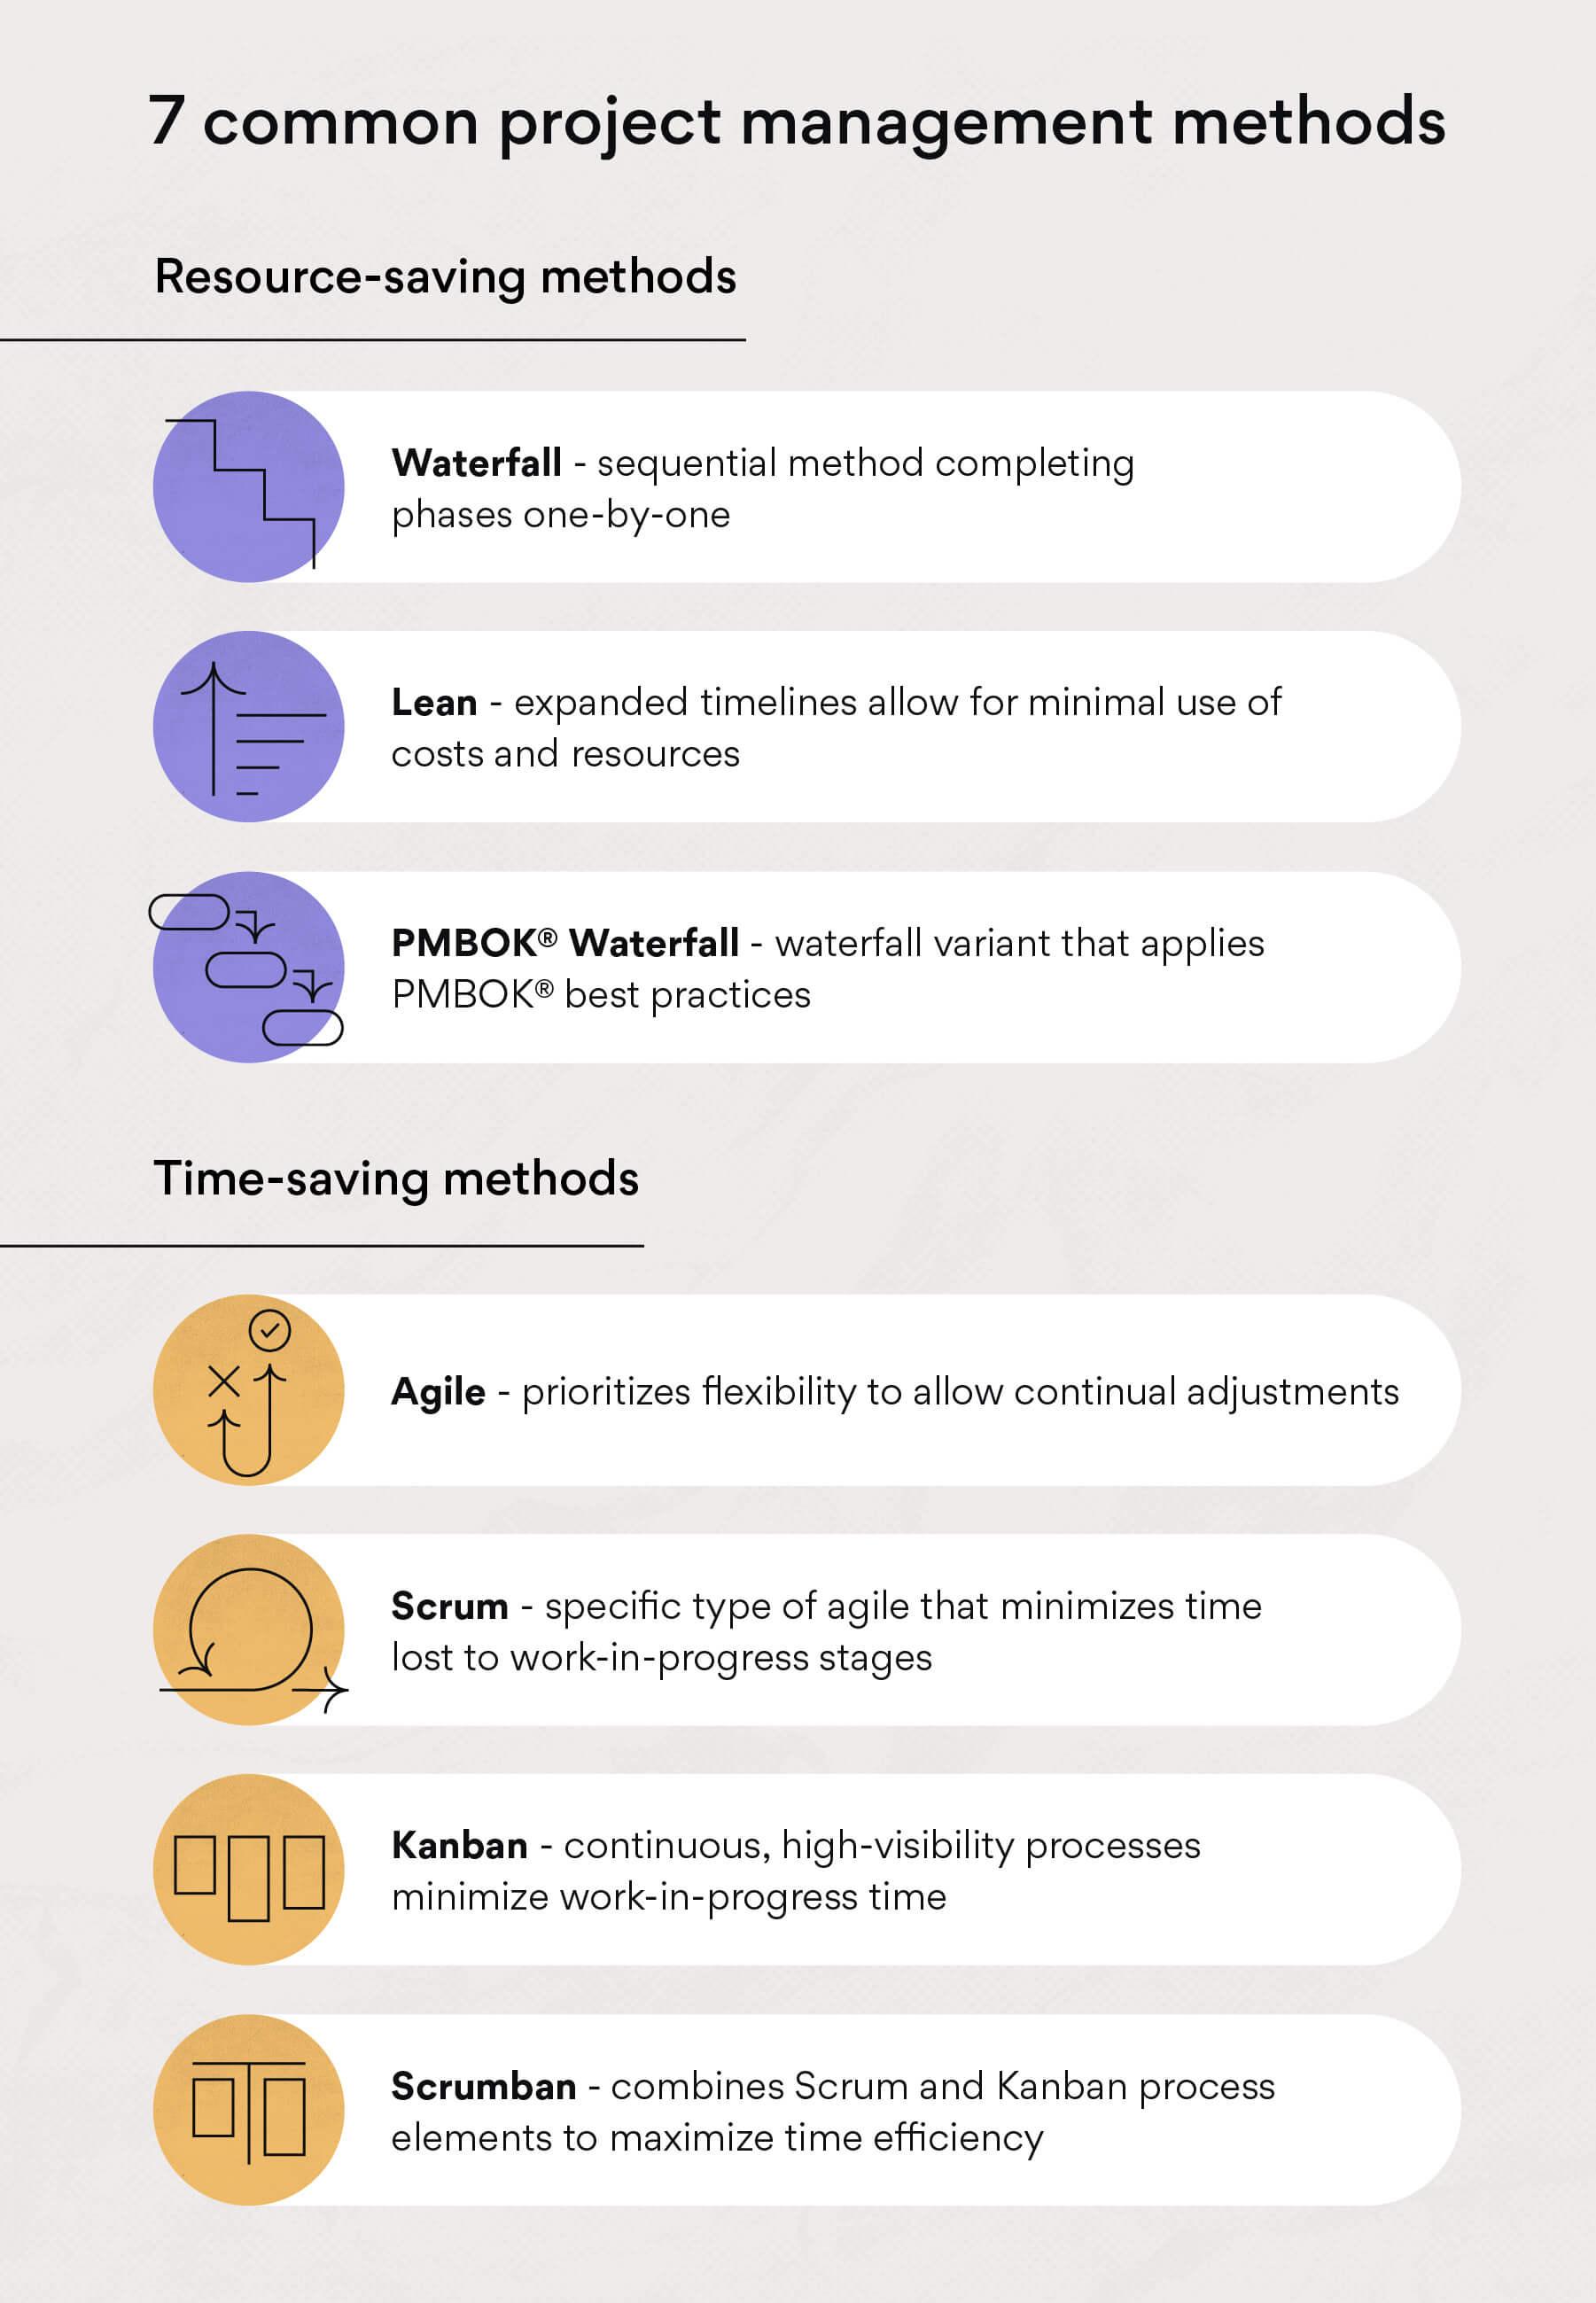 7 common project management methods